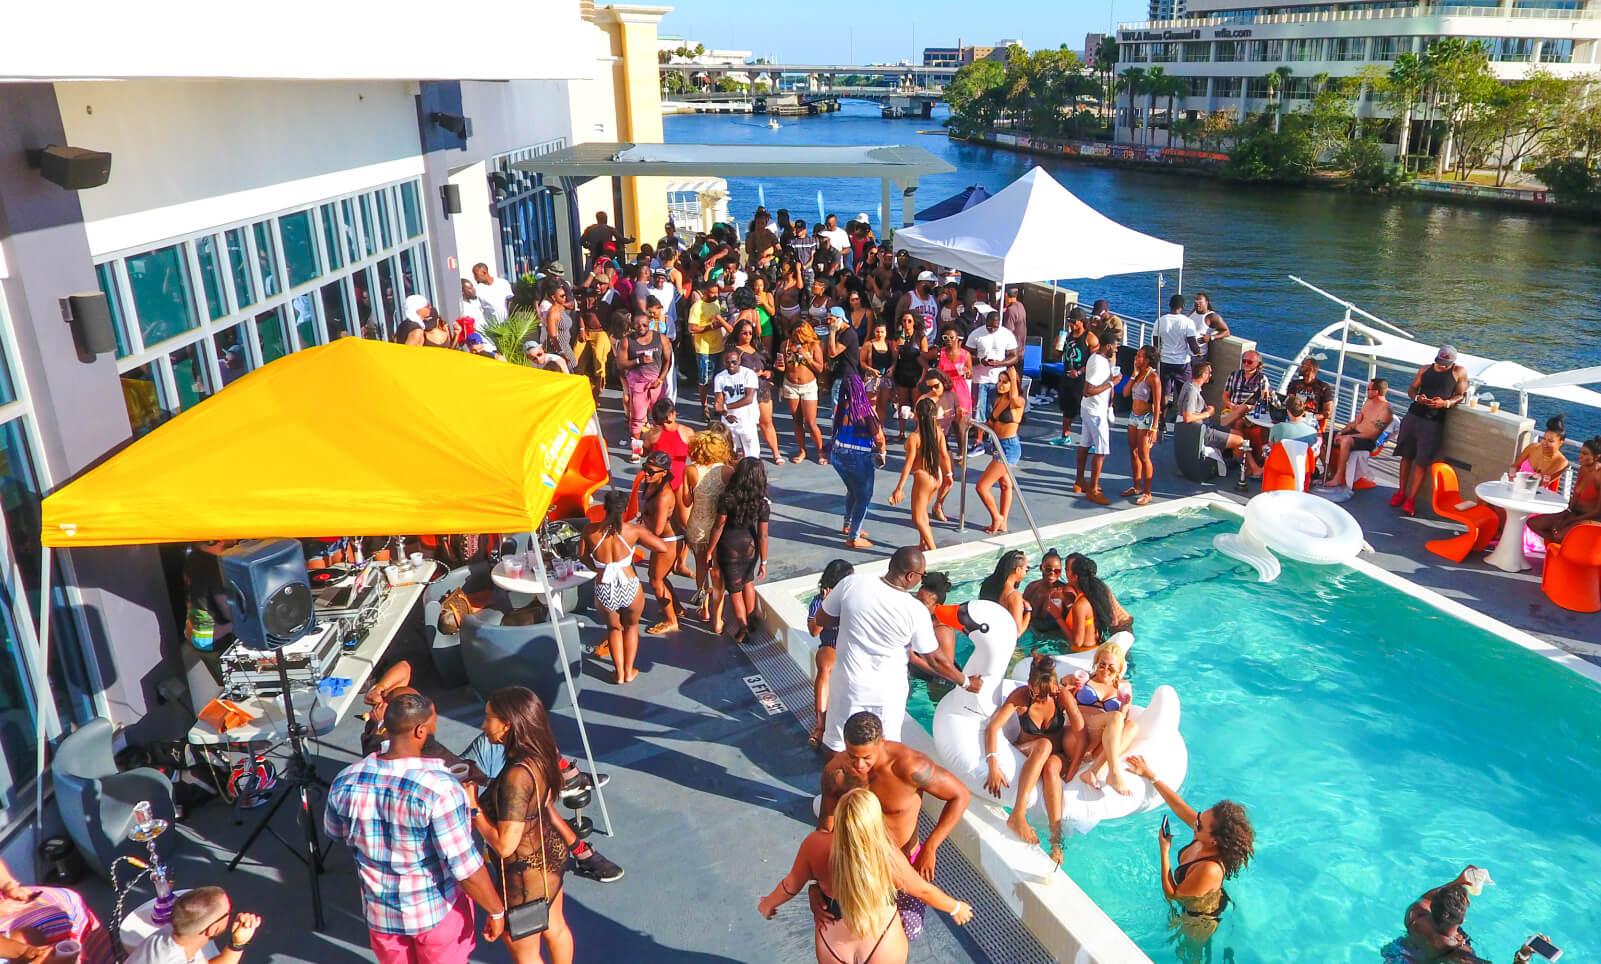 Aloft Tampa Pool